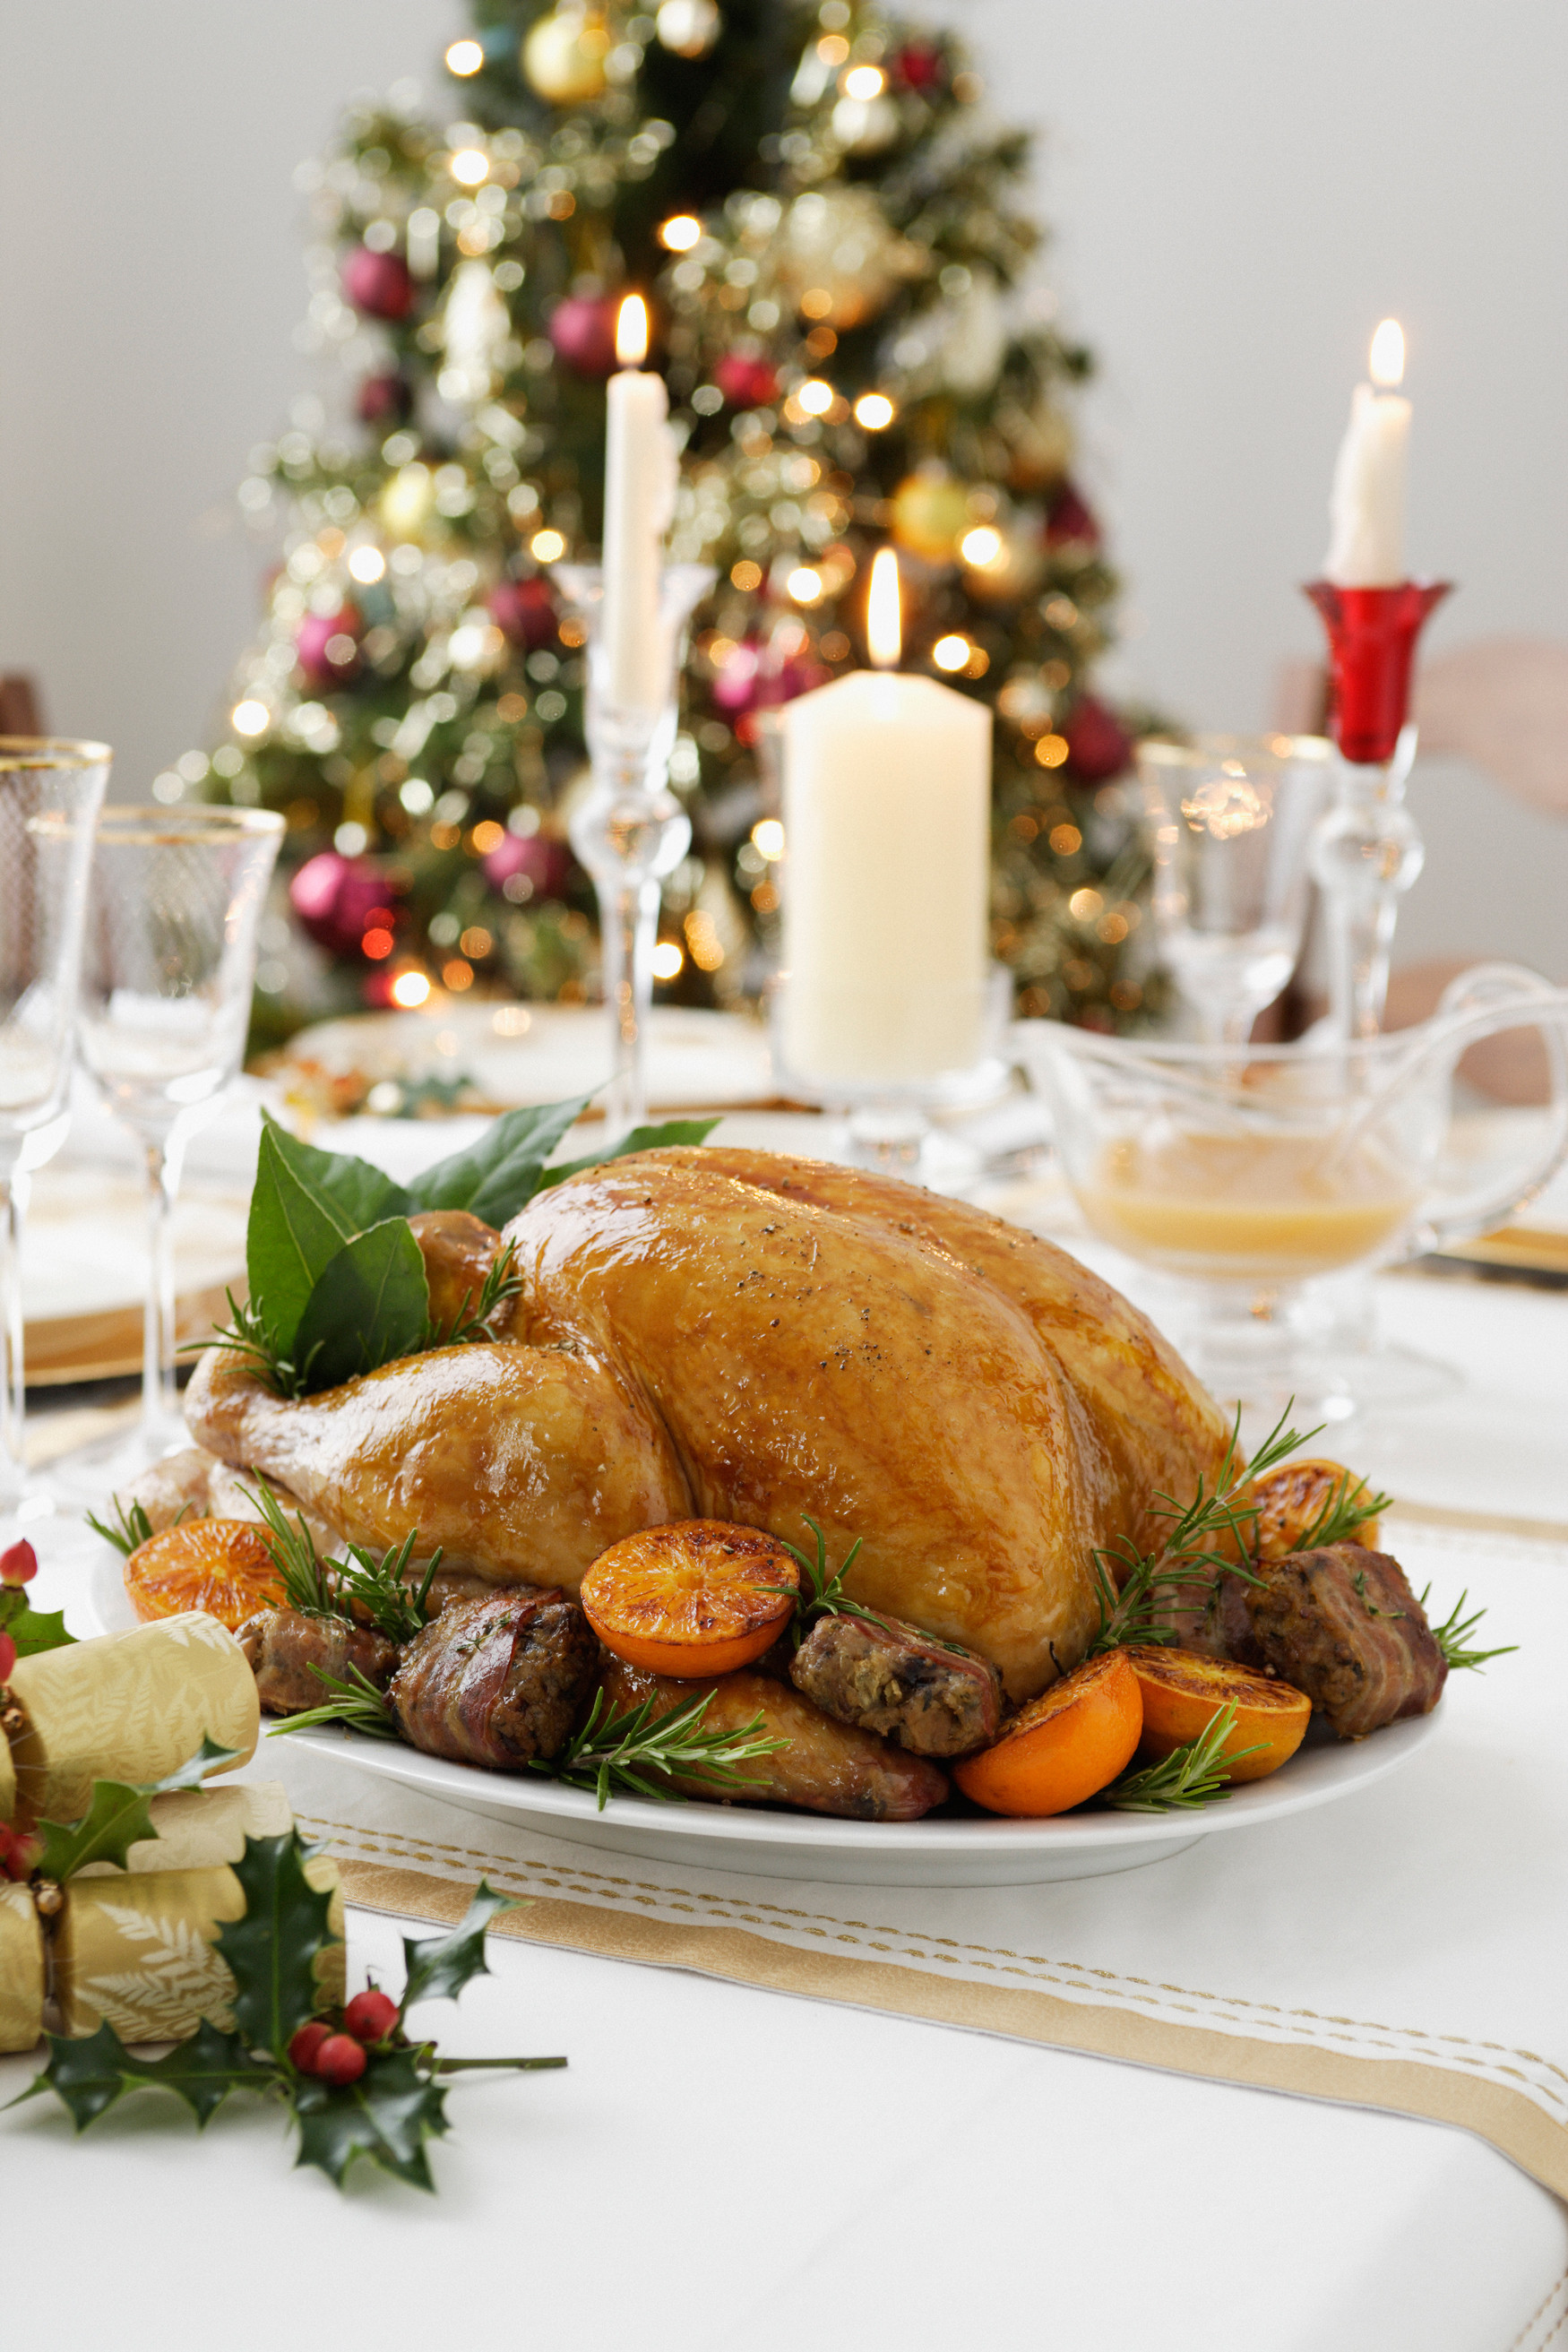 Menus For Christmas Dinners  5 Easy Christmas Dinner Menu Ideas plete Christmas